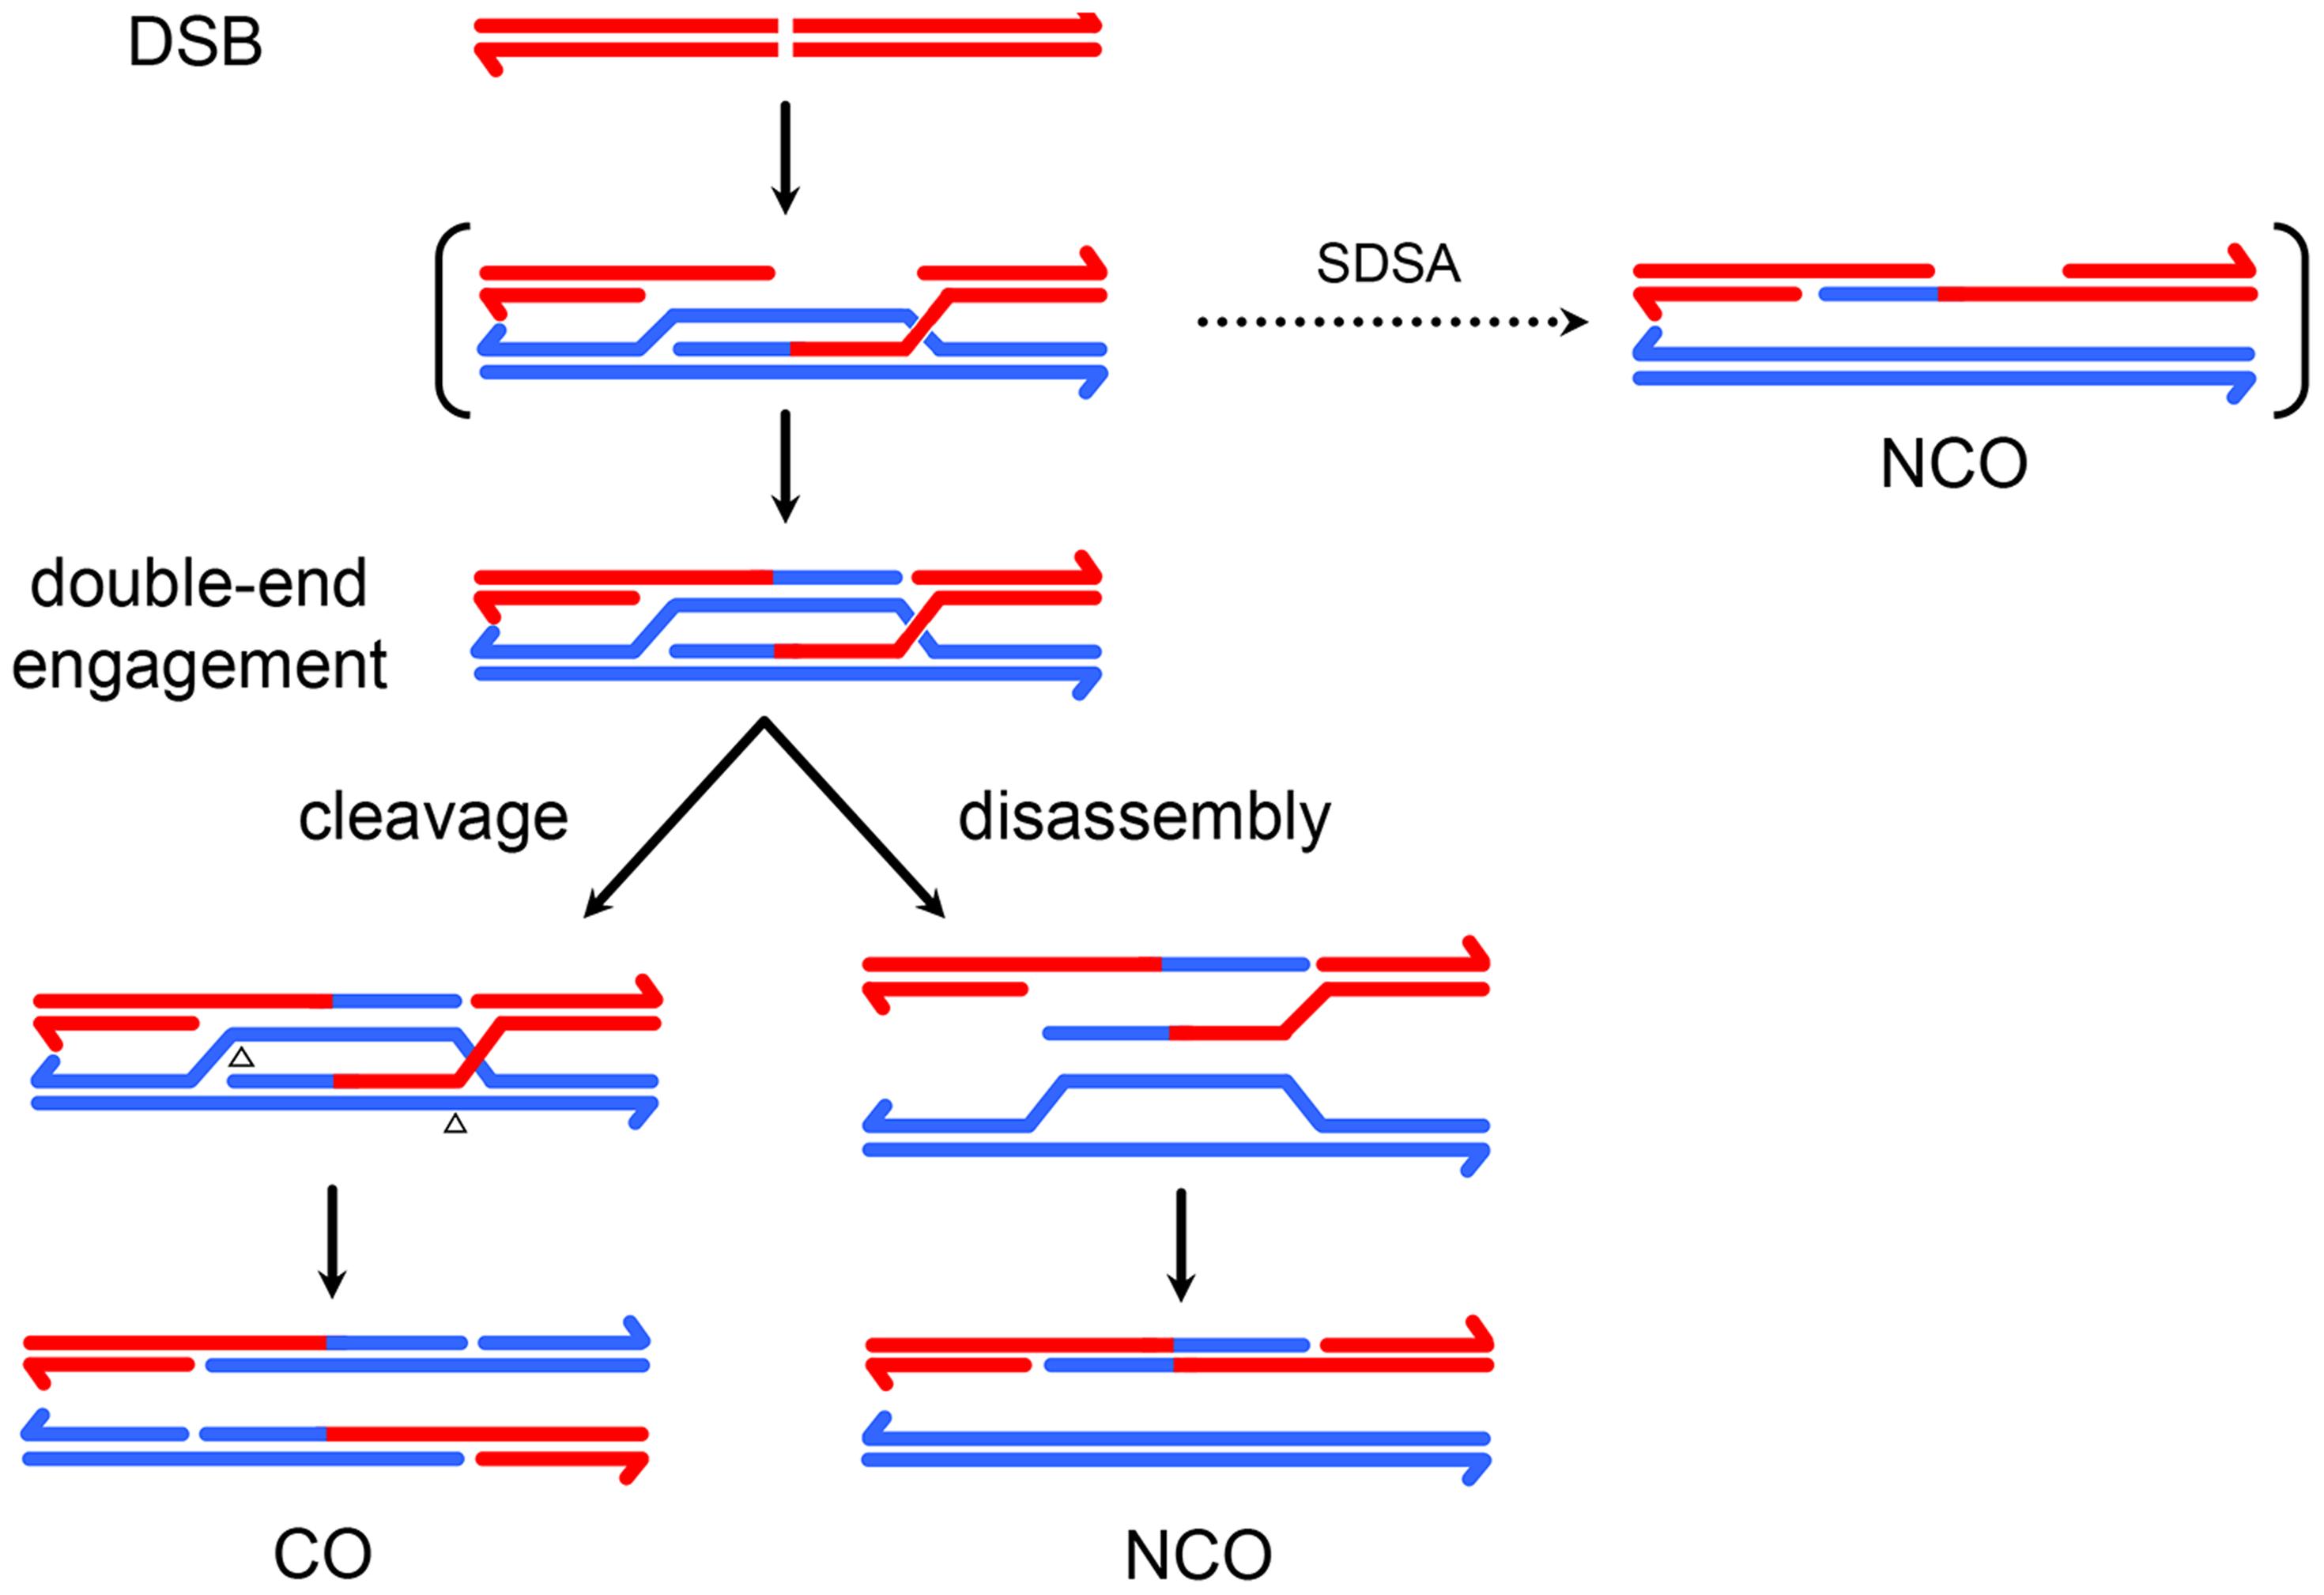 A model for meiotic recombination in <i>Drosophila</i>.